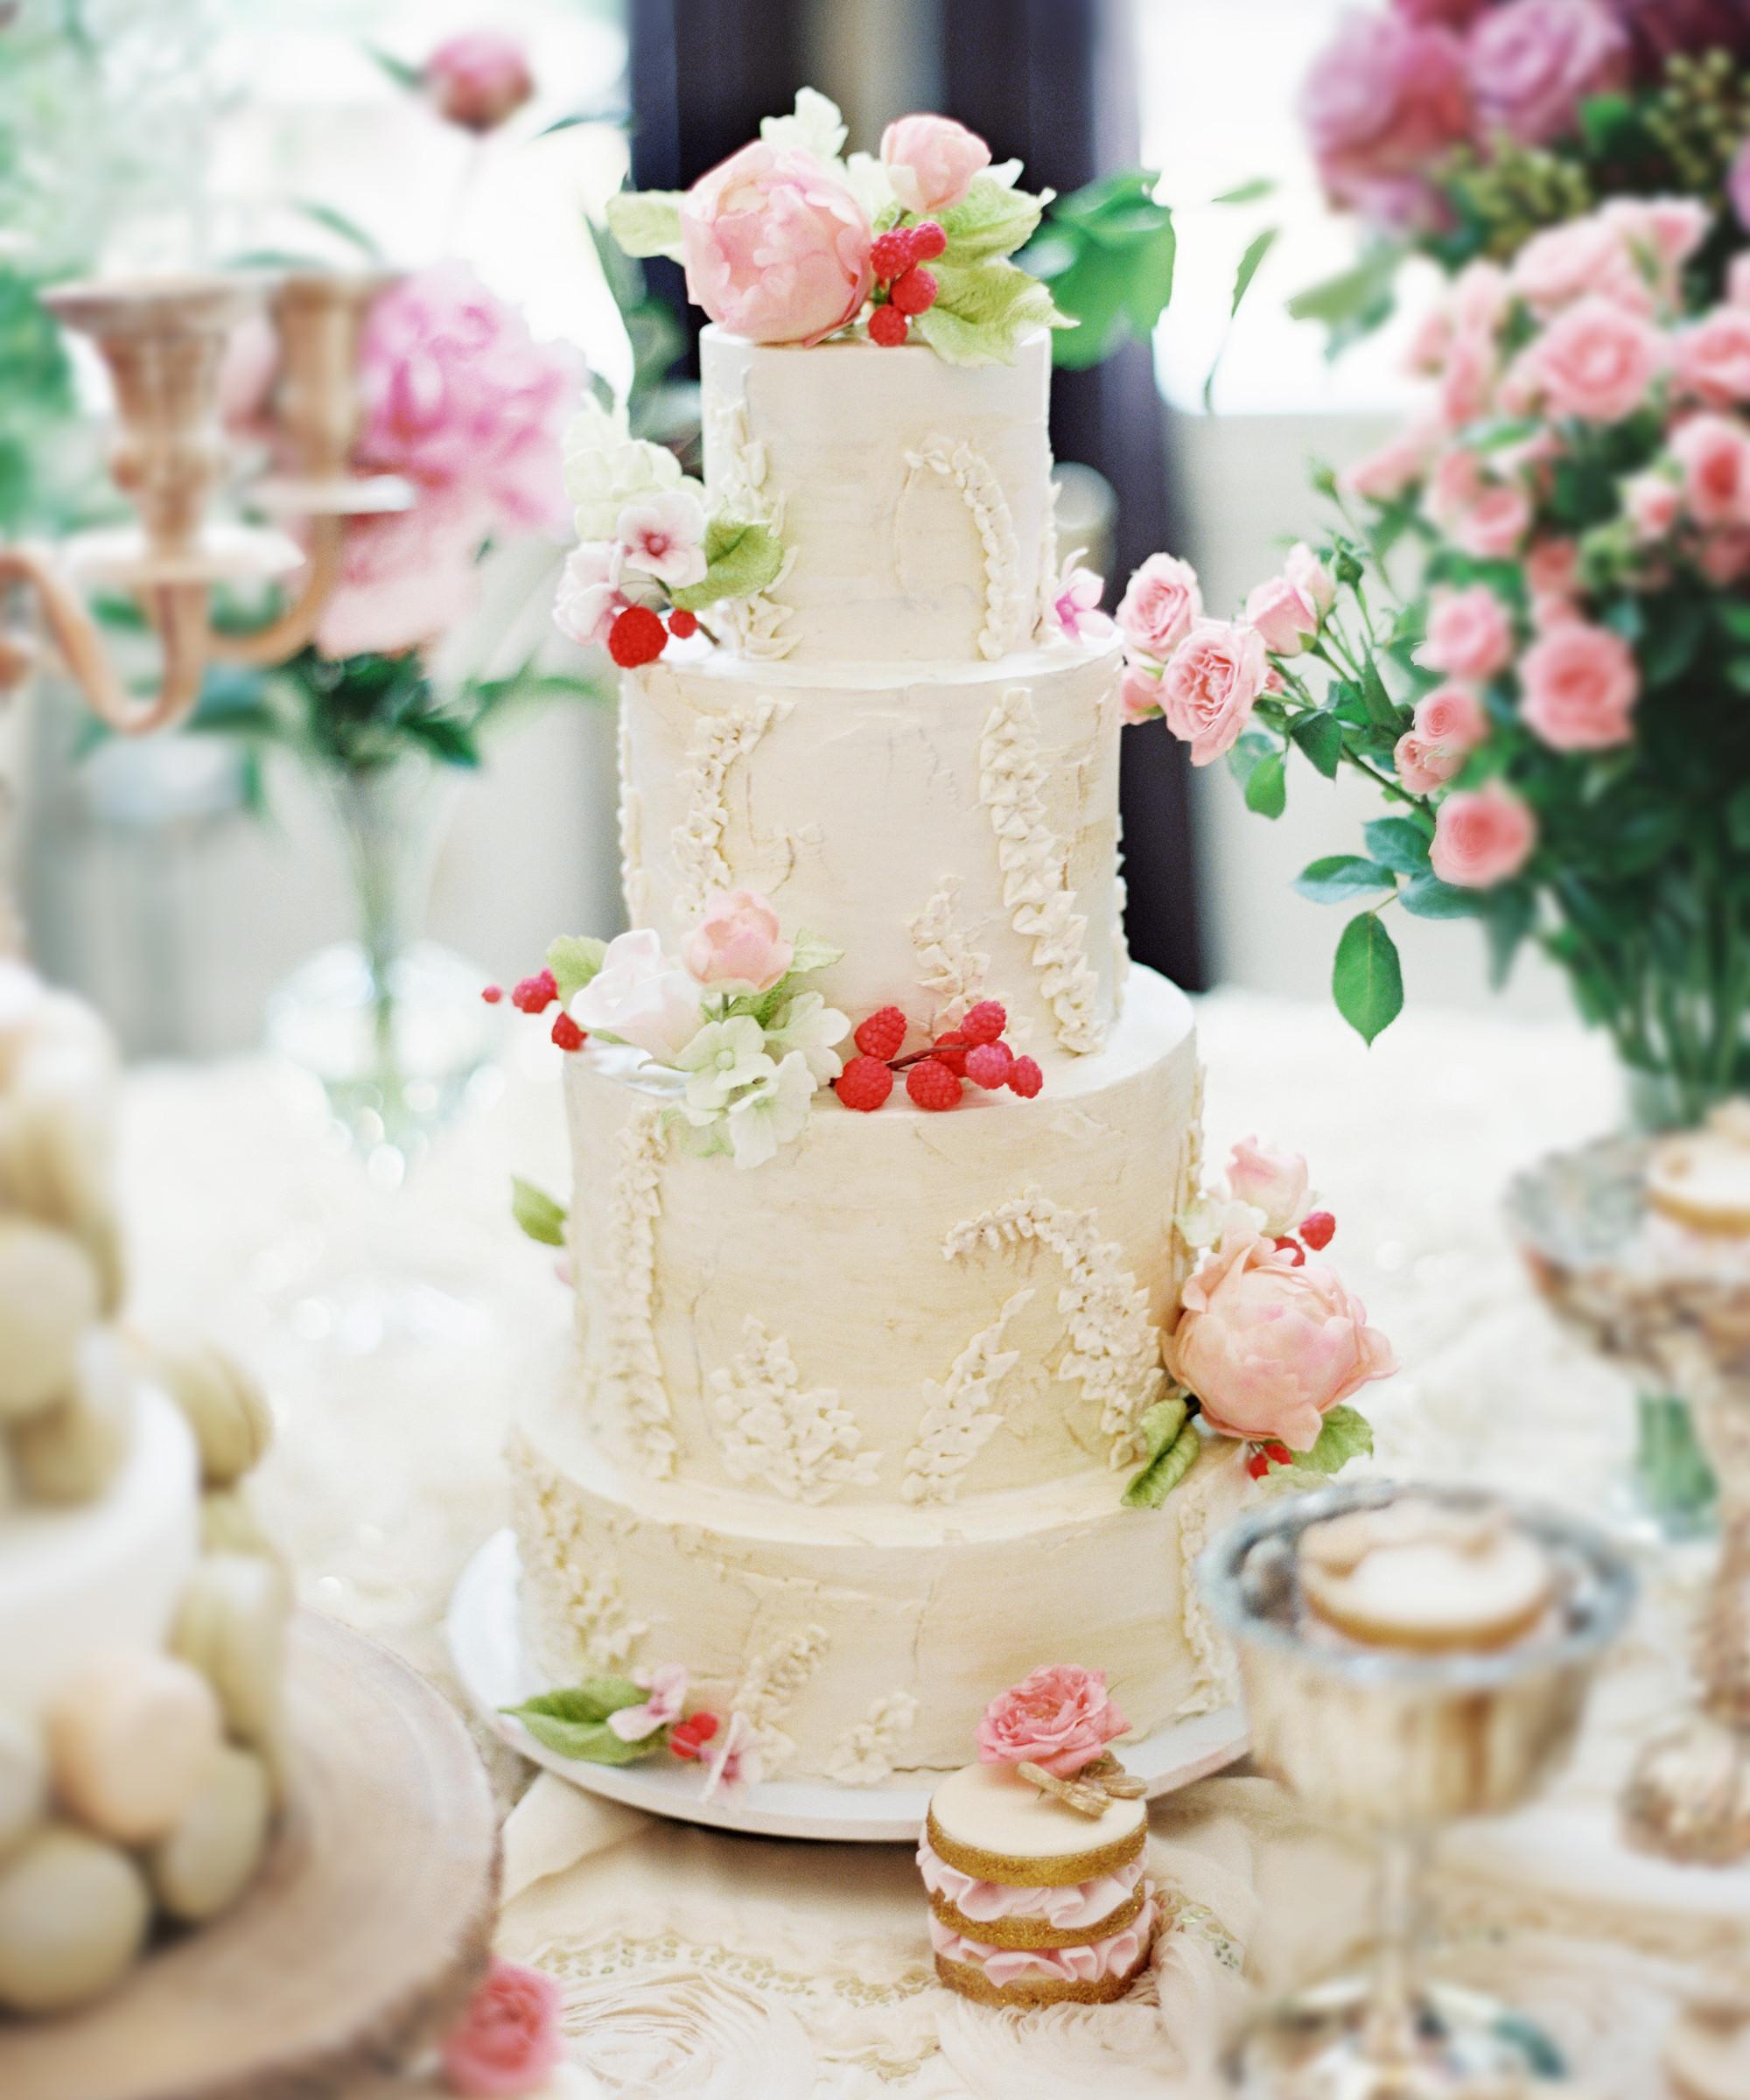 I Do Wedding Cakes  Vegan and Gluten Free Wedding Cake Ideas Alternative